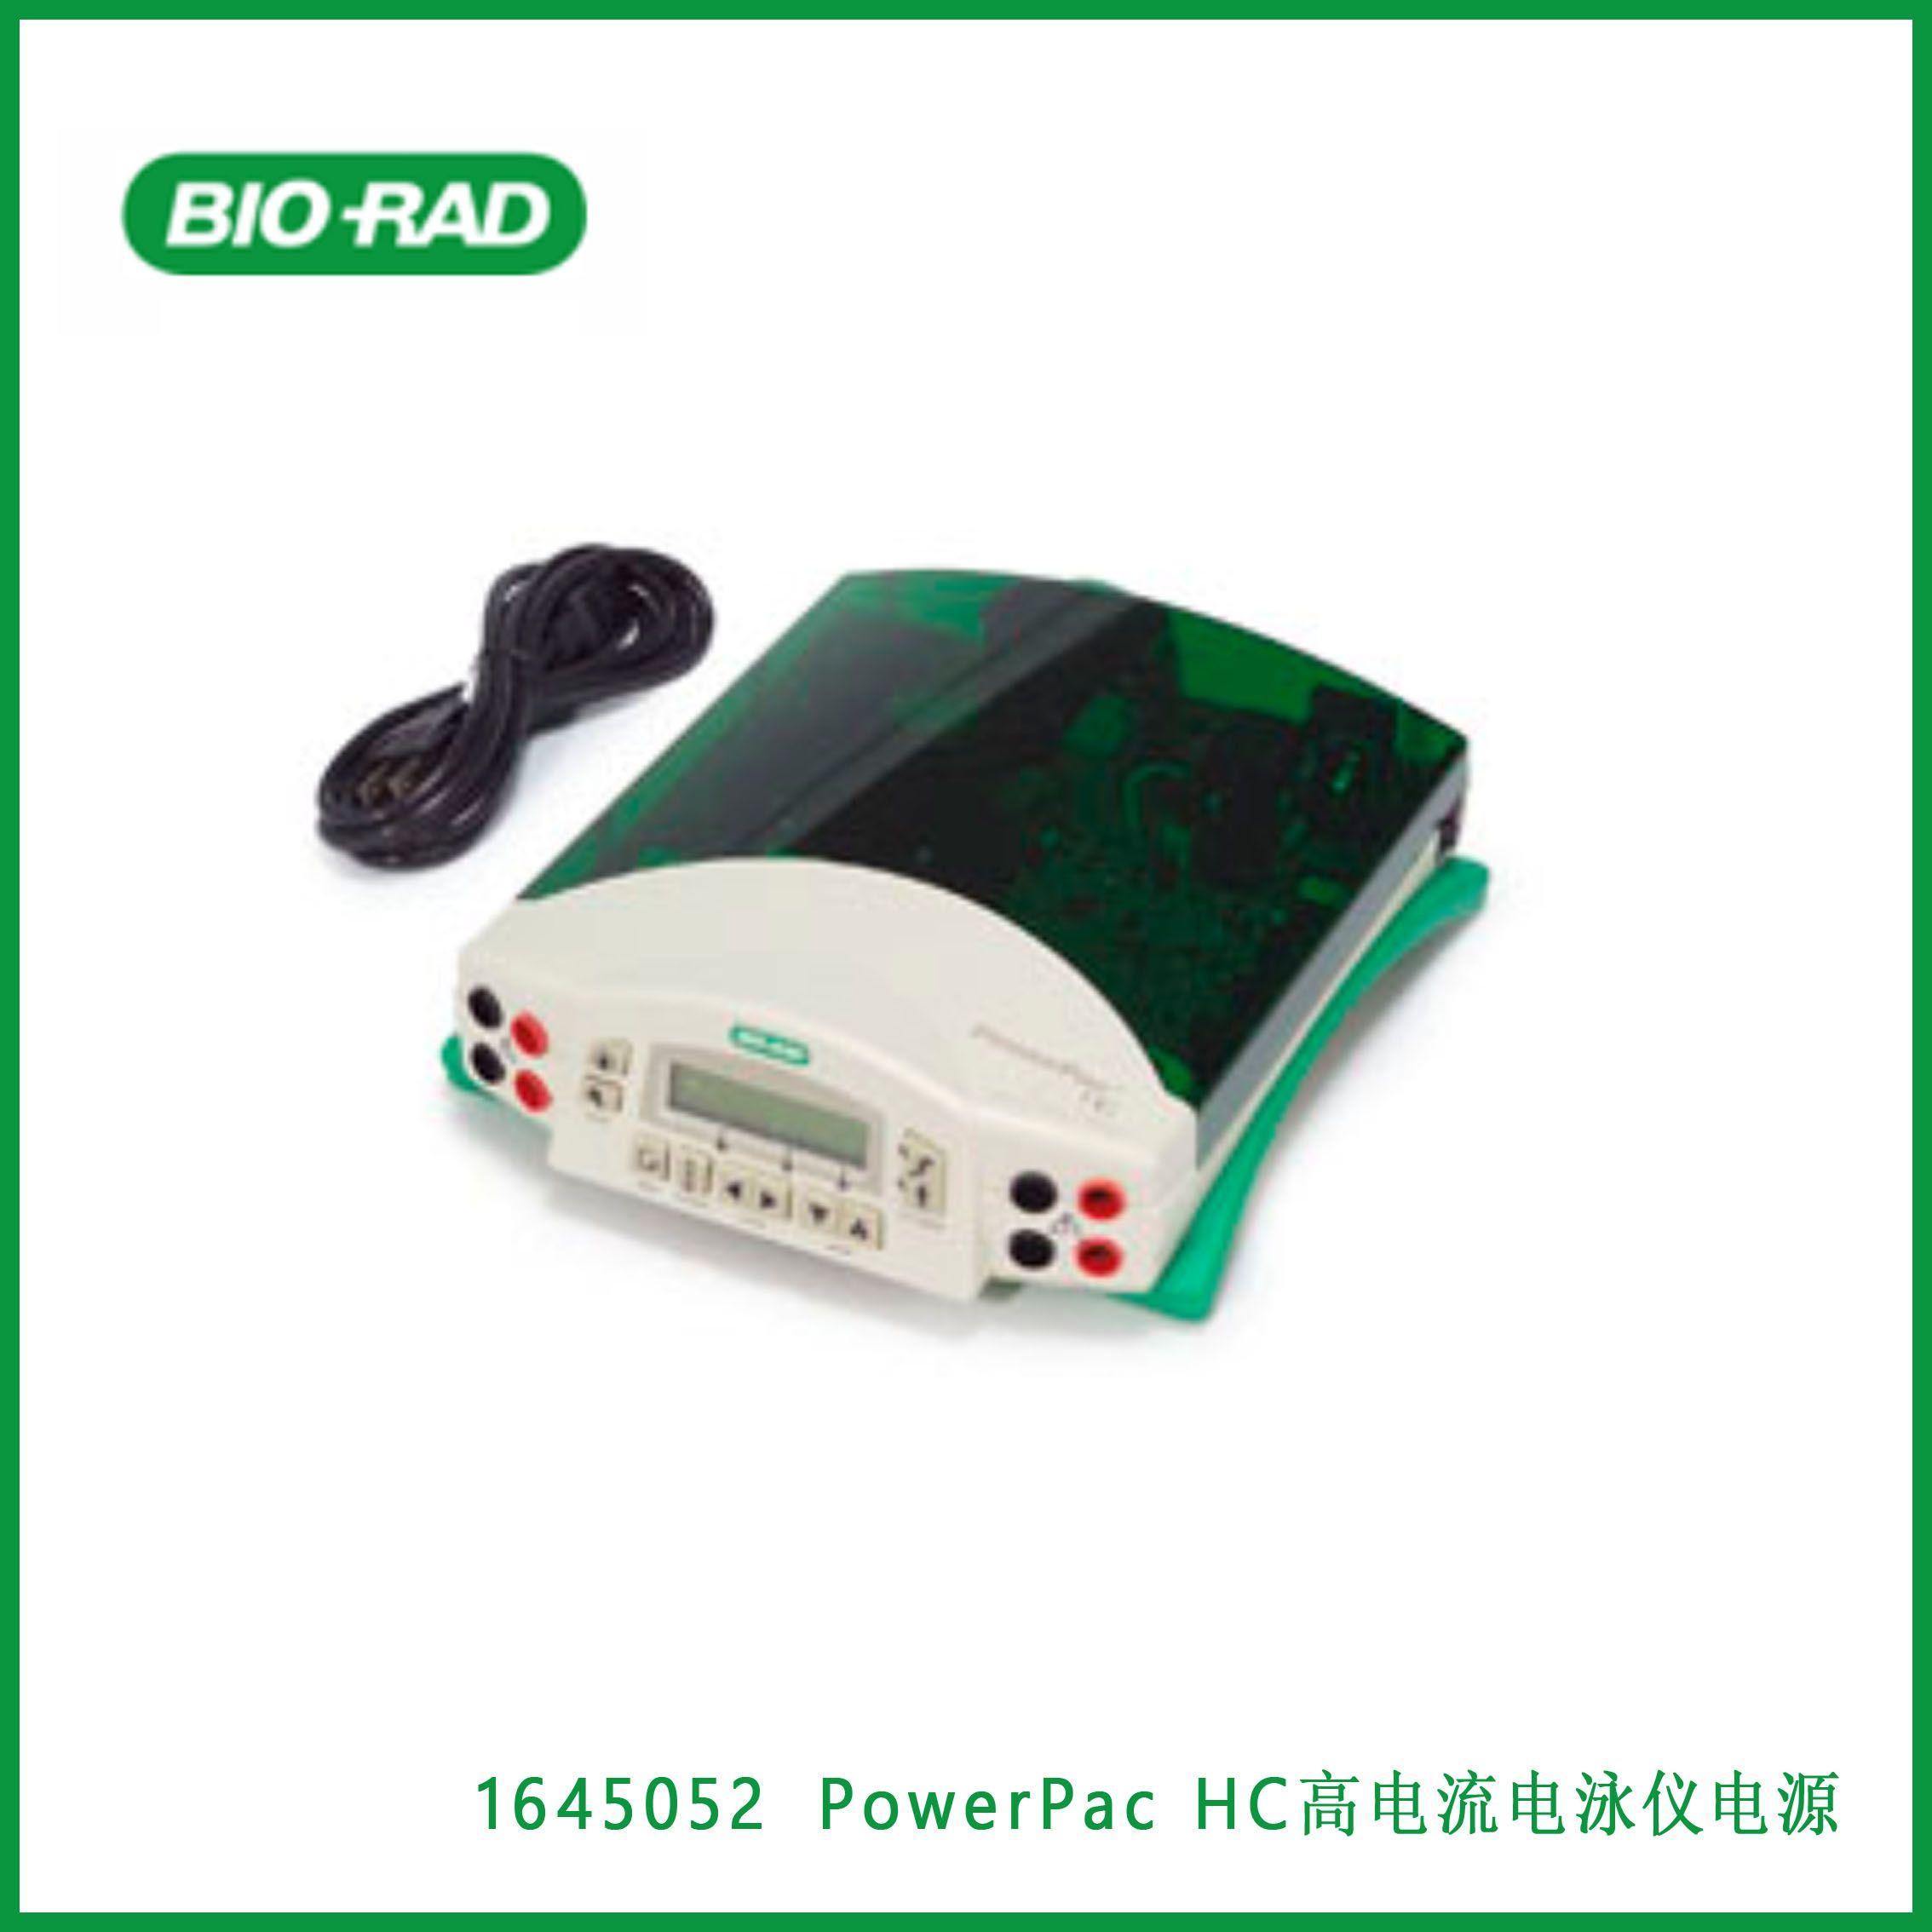 伯乐Bio-Rad1645052PowerPac HC Power Supply; 100 -120/220 -240V,PowerPac HC高电流电泳仪电源,现货